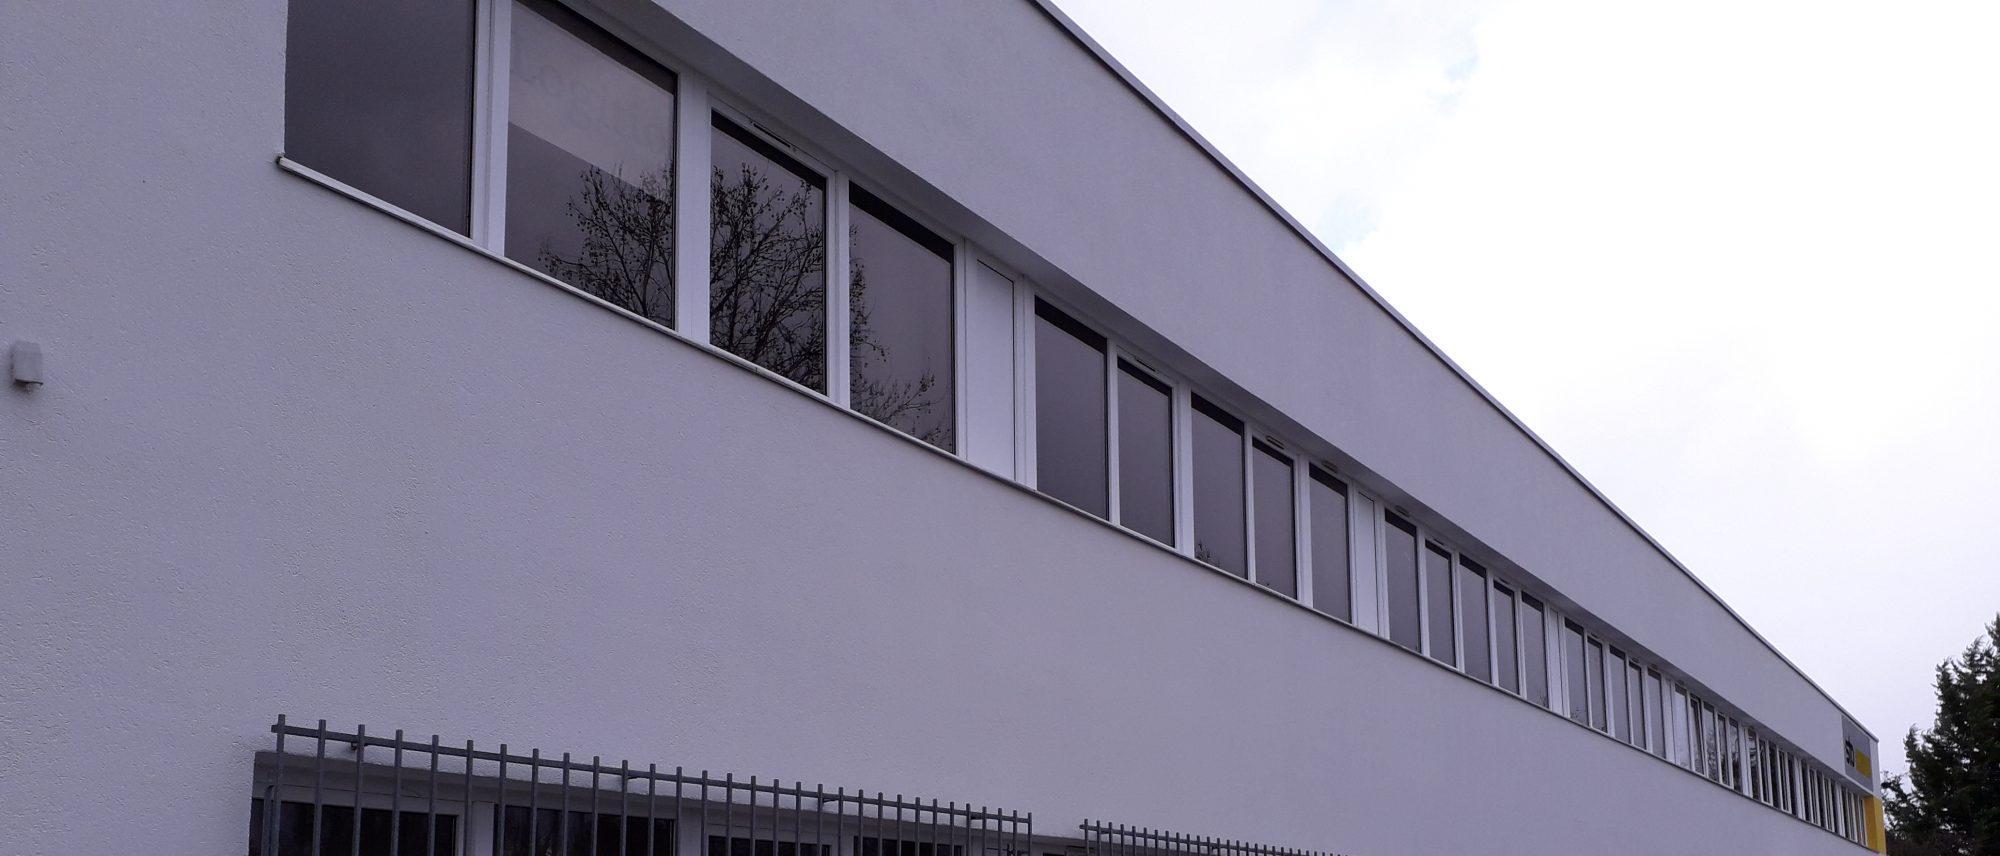 Schiltigheim -Vogellau bureaux rénovés d'environ 58m² - 20m²